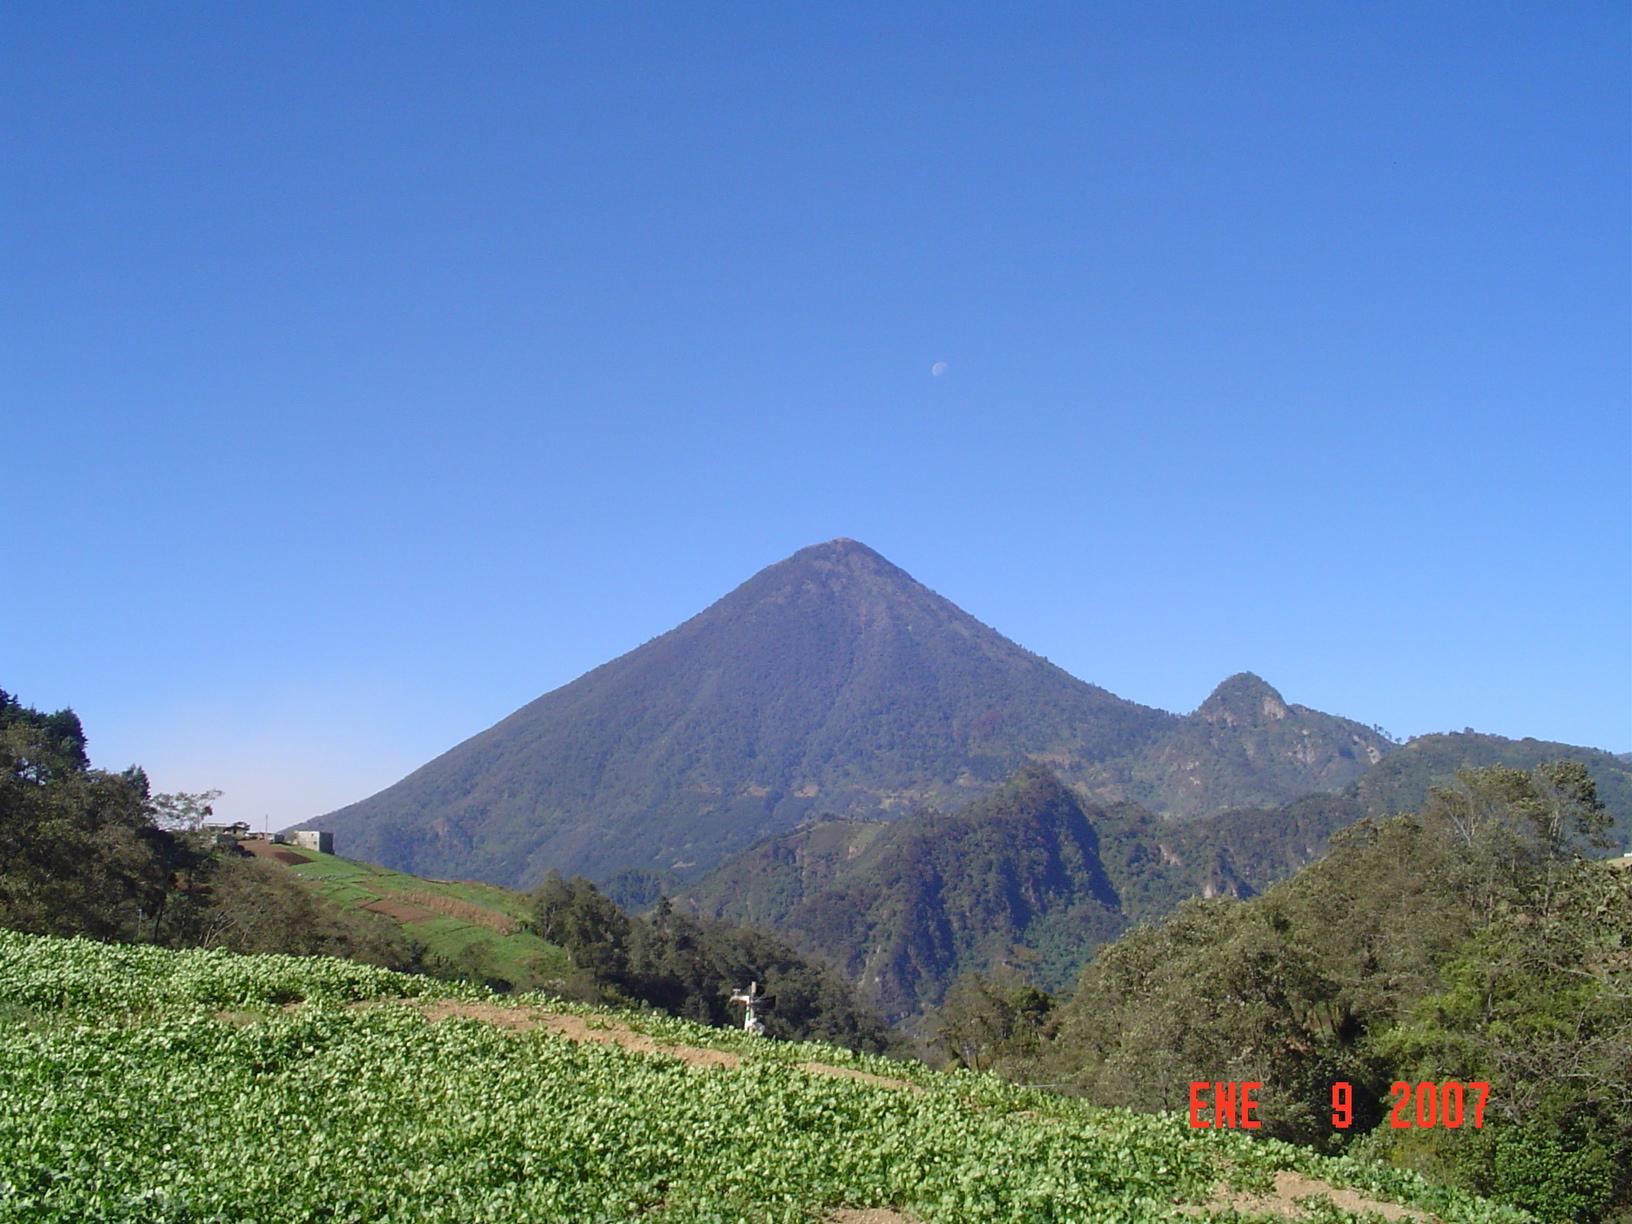 Volcán Santa María.  [Public domain], via Wikimedia Commons